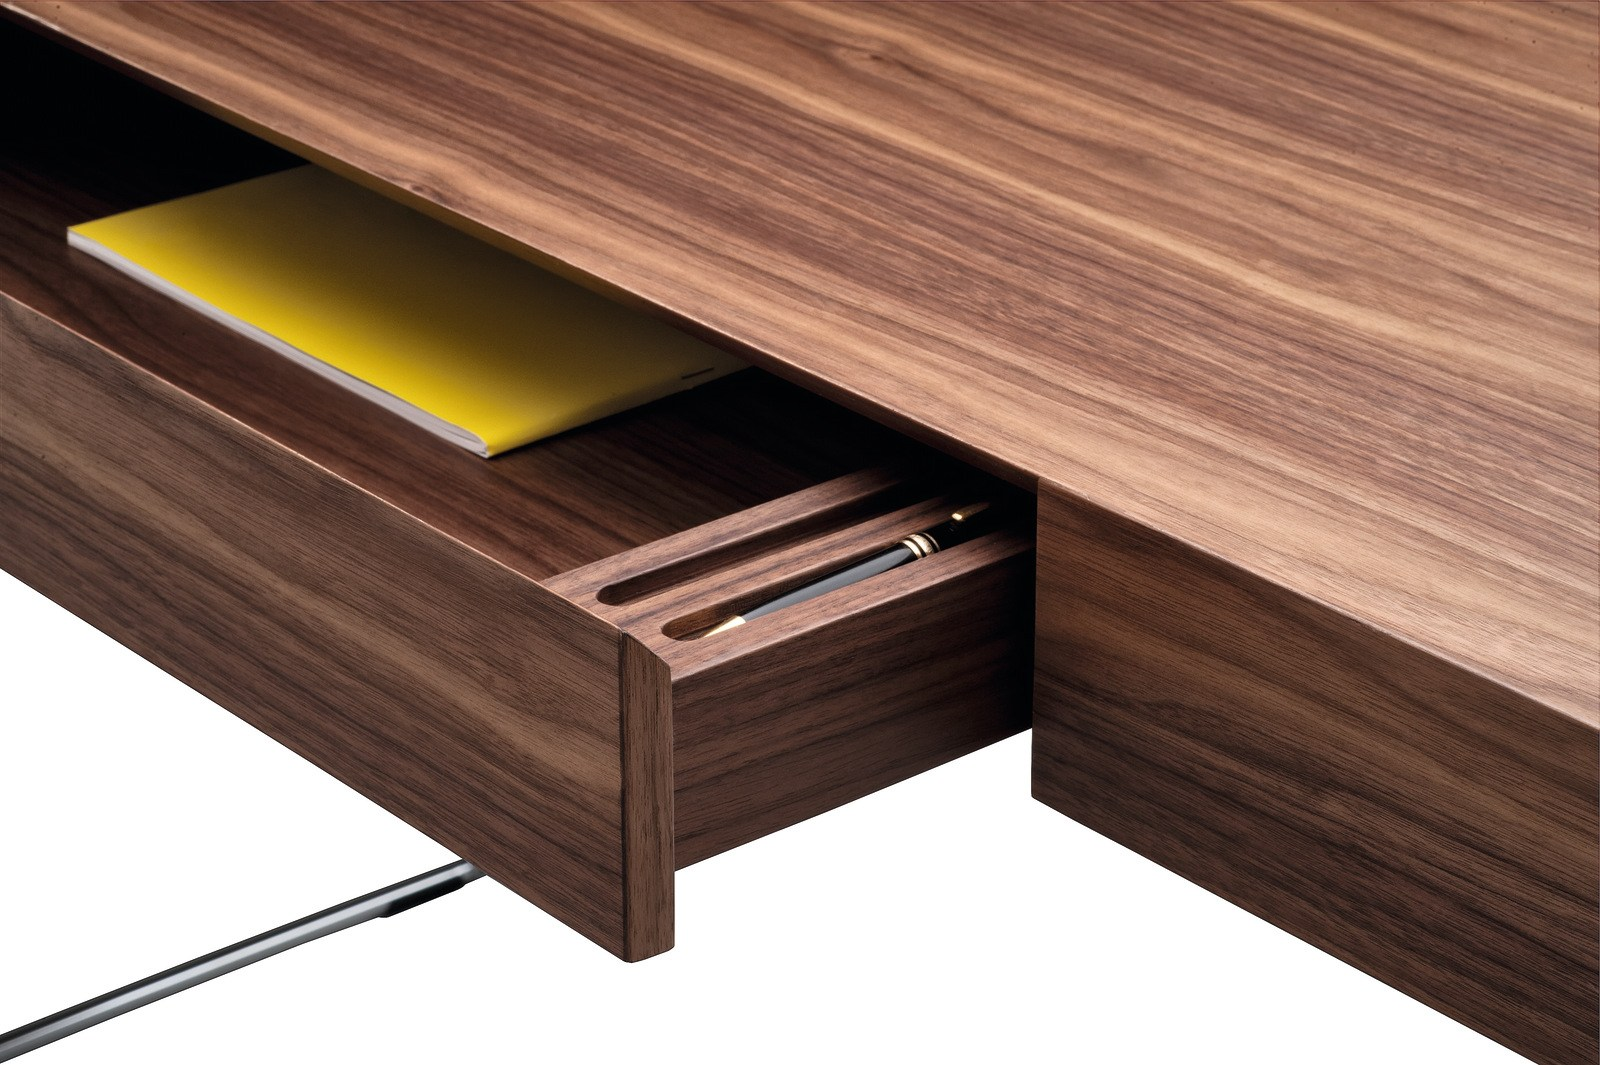 wood veneer secretary desk maestrale by zanotta design. Black Bedroom Furniture Sets. Home Design Ideas